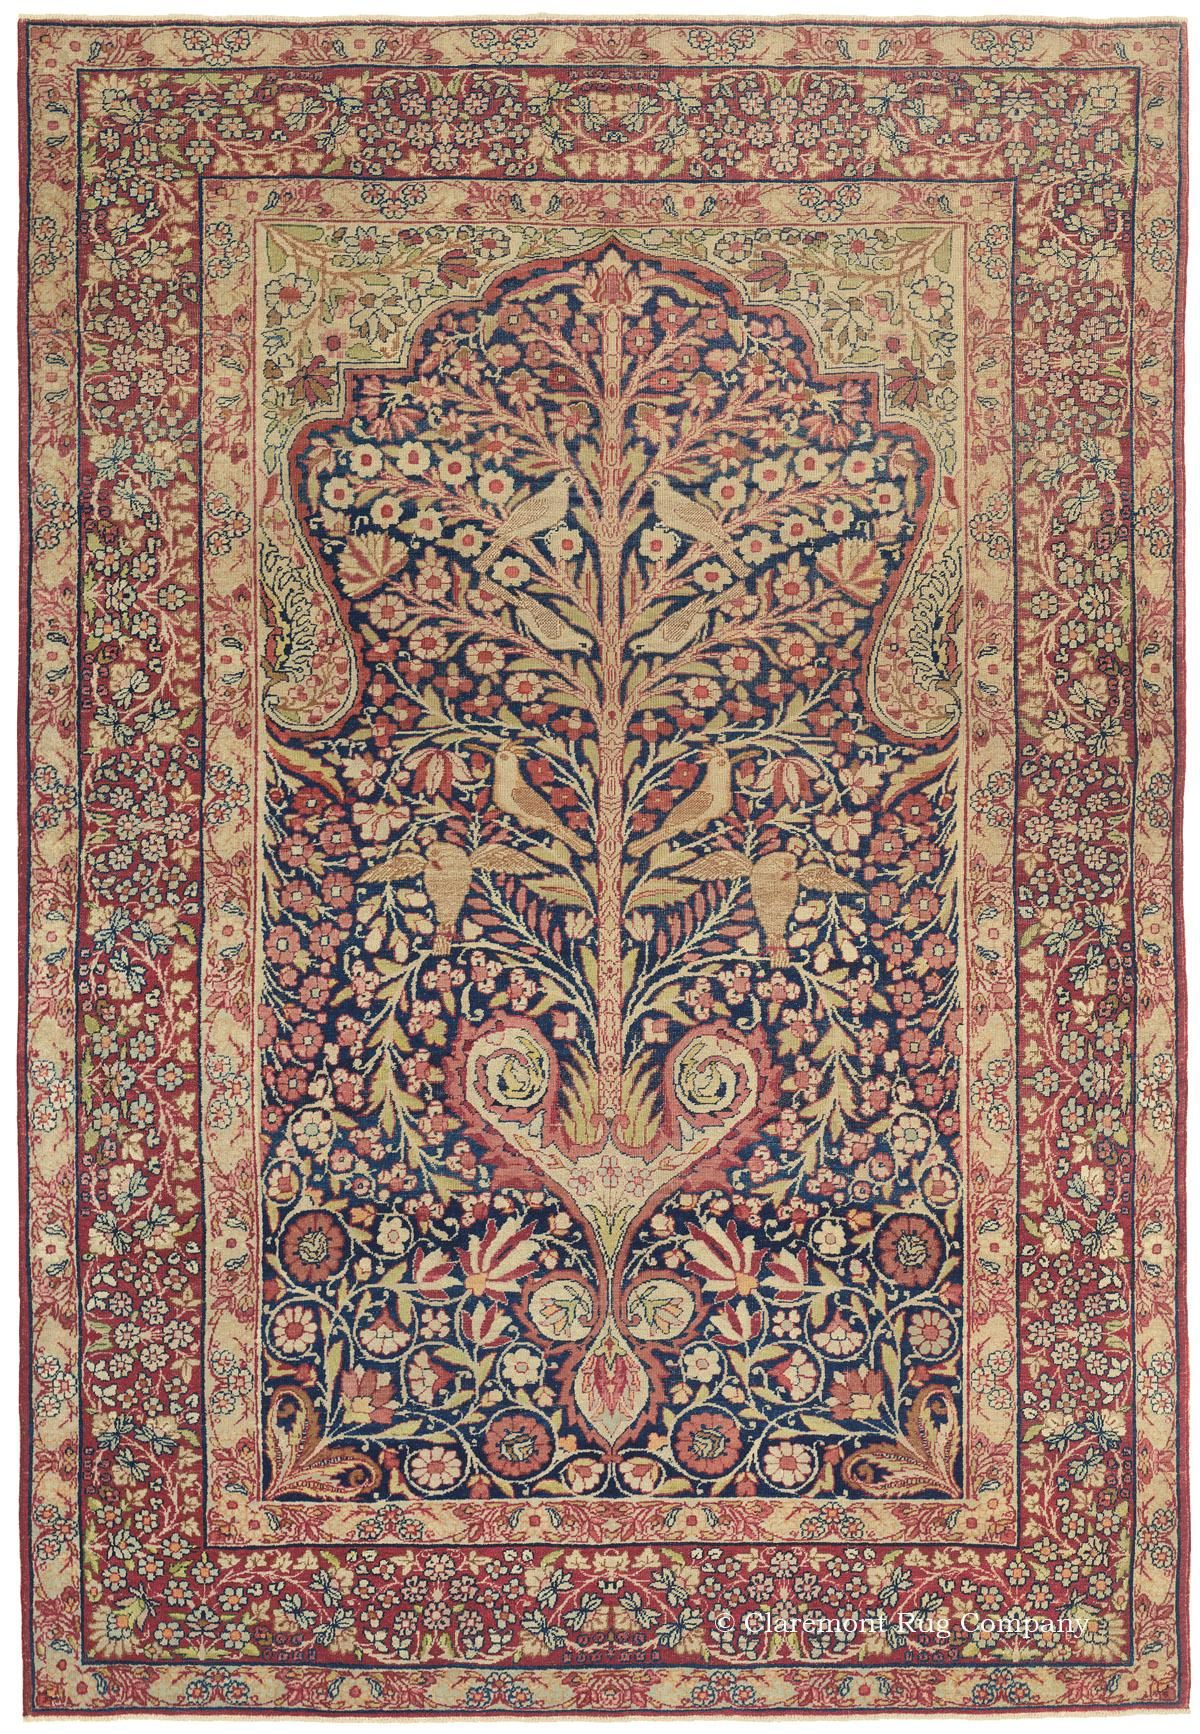 Antique Oriental Carpet Laver Kirman Persian Carpet Antique Persian Carpet Antique Persian Rug